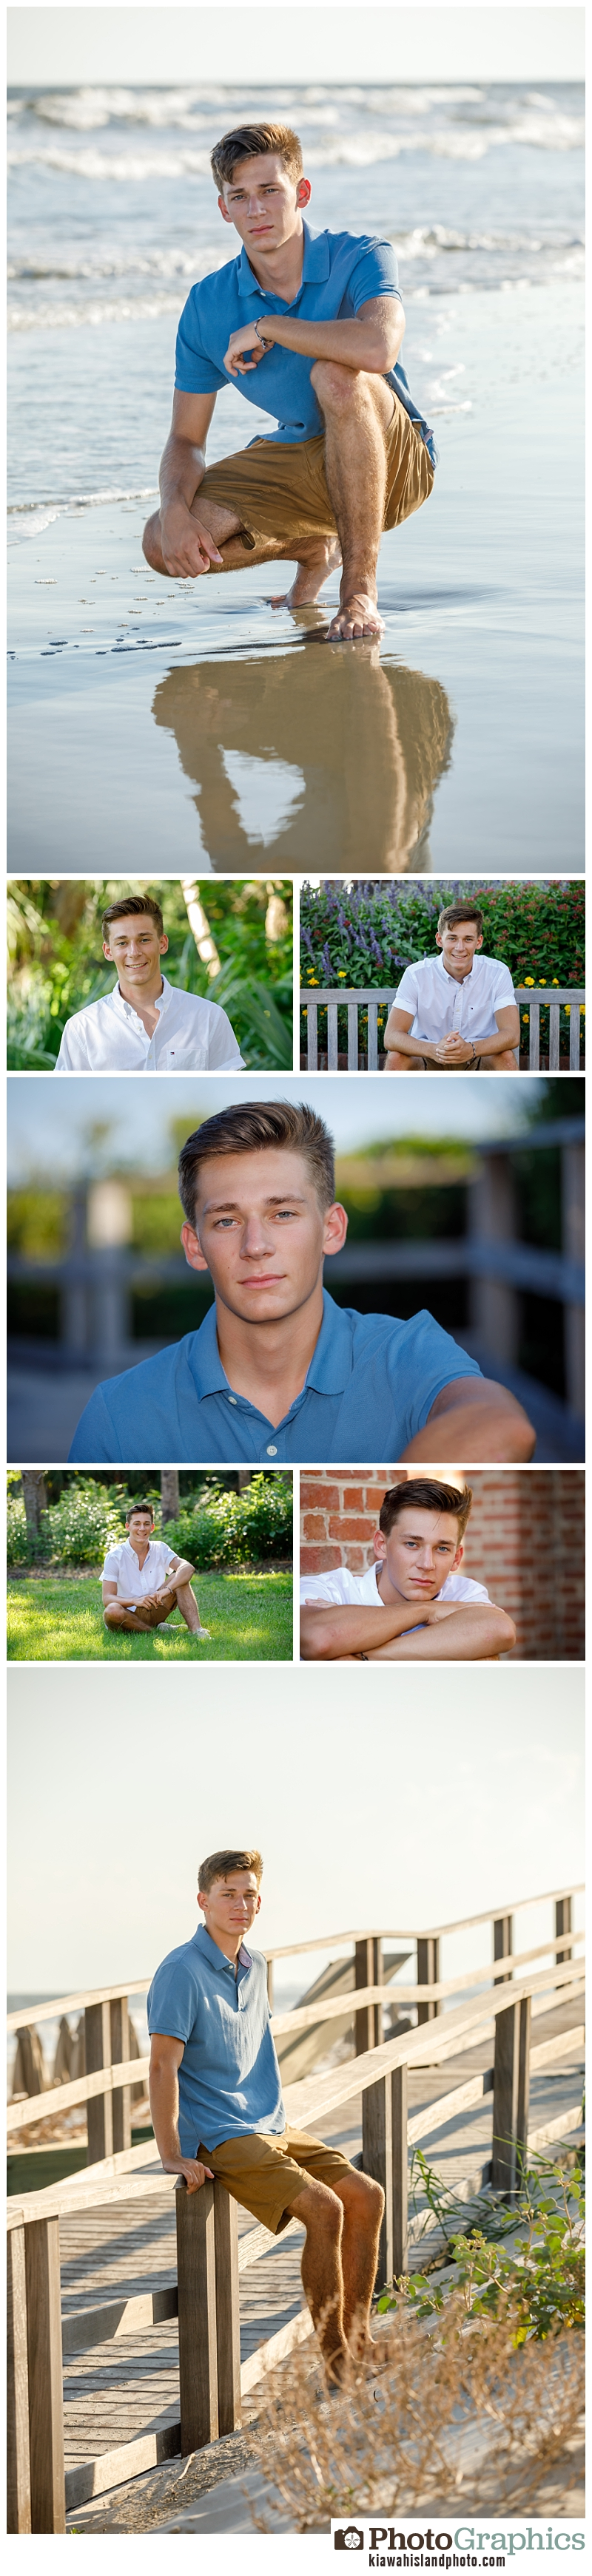 senior portraits on kiawah island male senior 12 grade